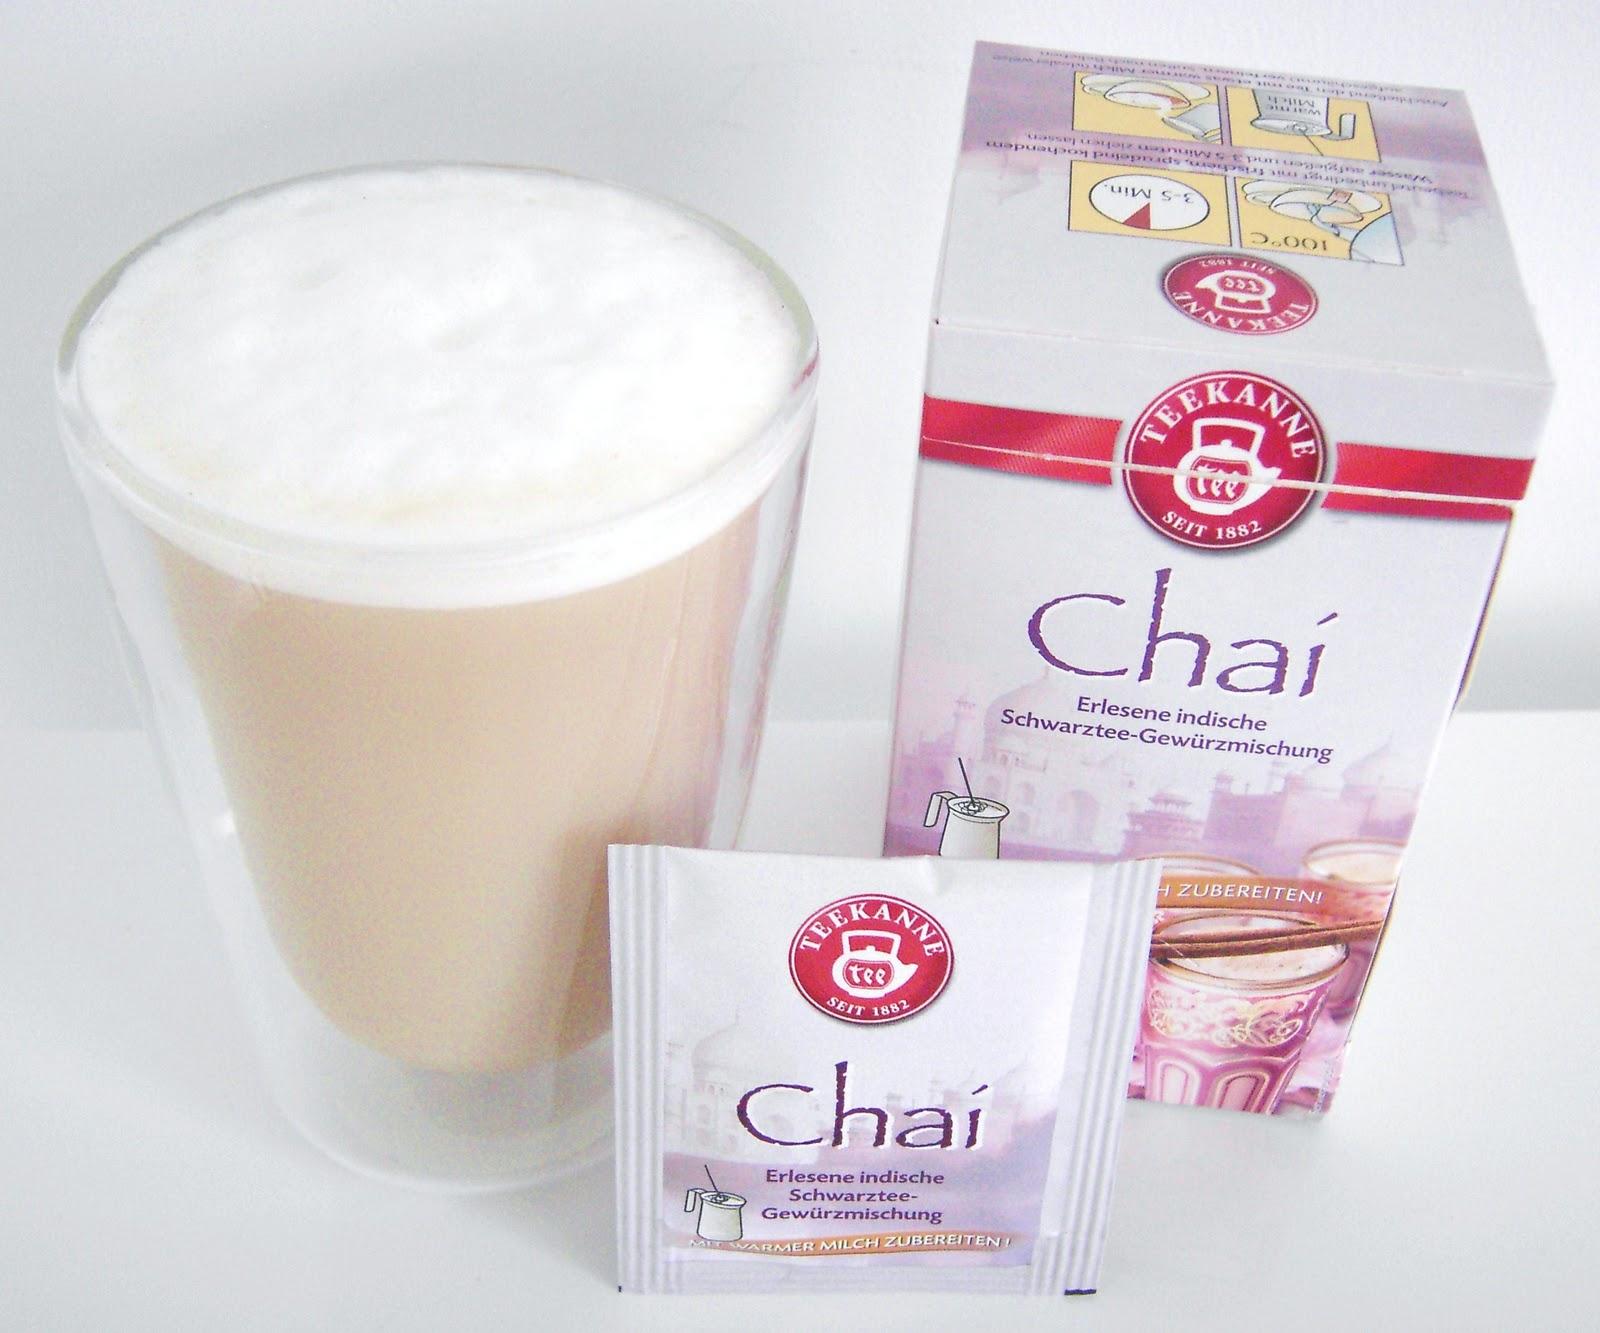 Teekanne Indische Teemischung Fairtrade bwin 200 Pfund Bonus bwin live app download 20 Beutel Tee bwin free 50 Wette Teesorten ...